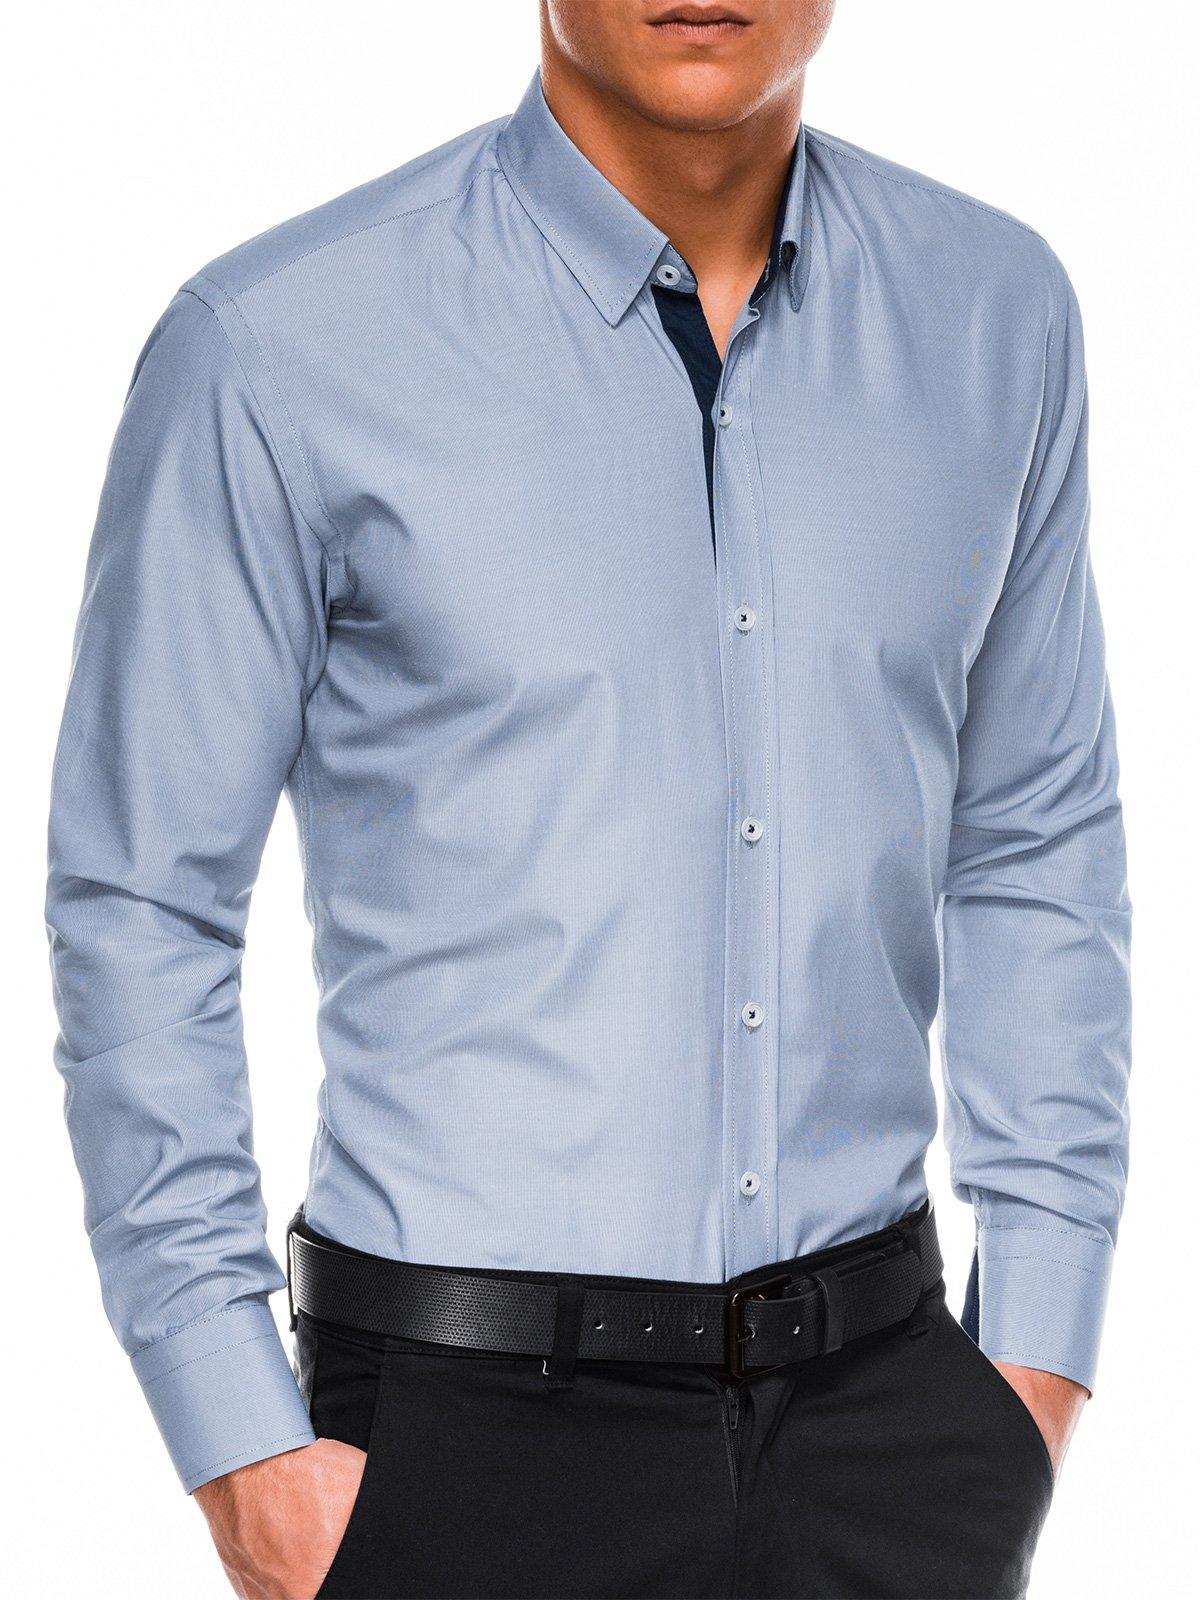 Купить со скидкой Сорочка чоловіча елегантна з довгим рукавом K472 – синя/темно-синя